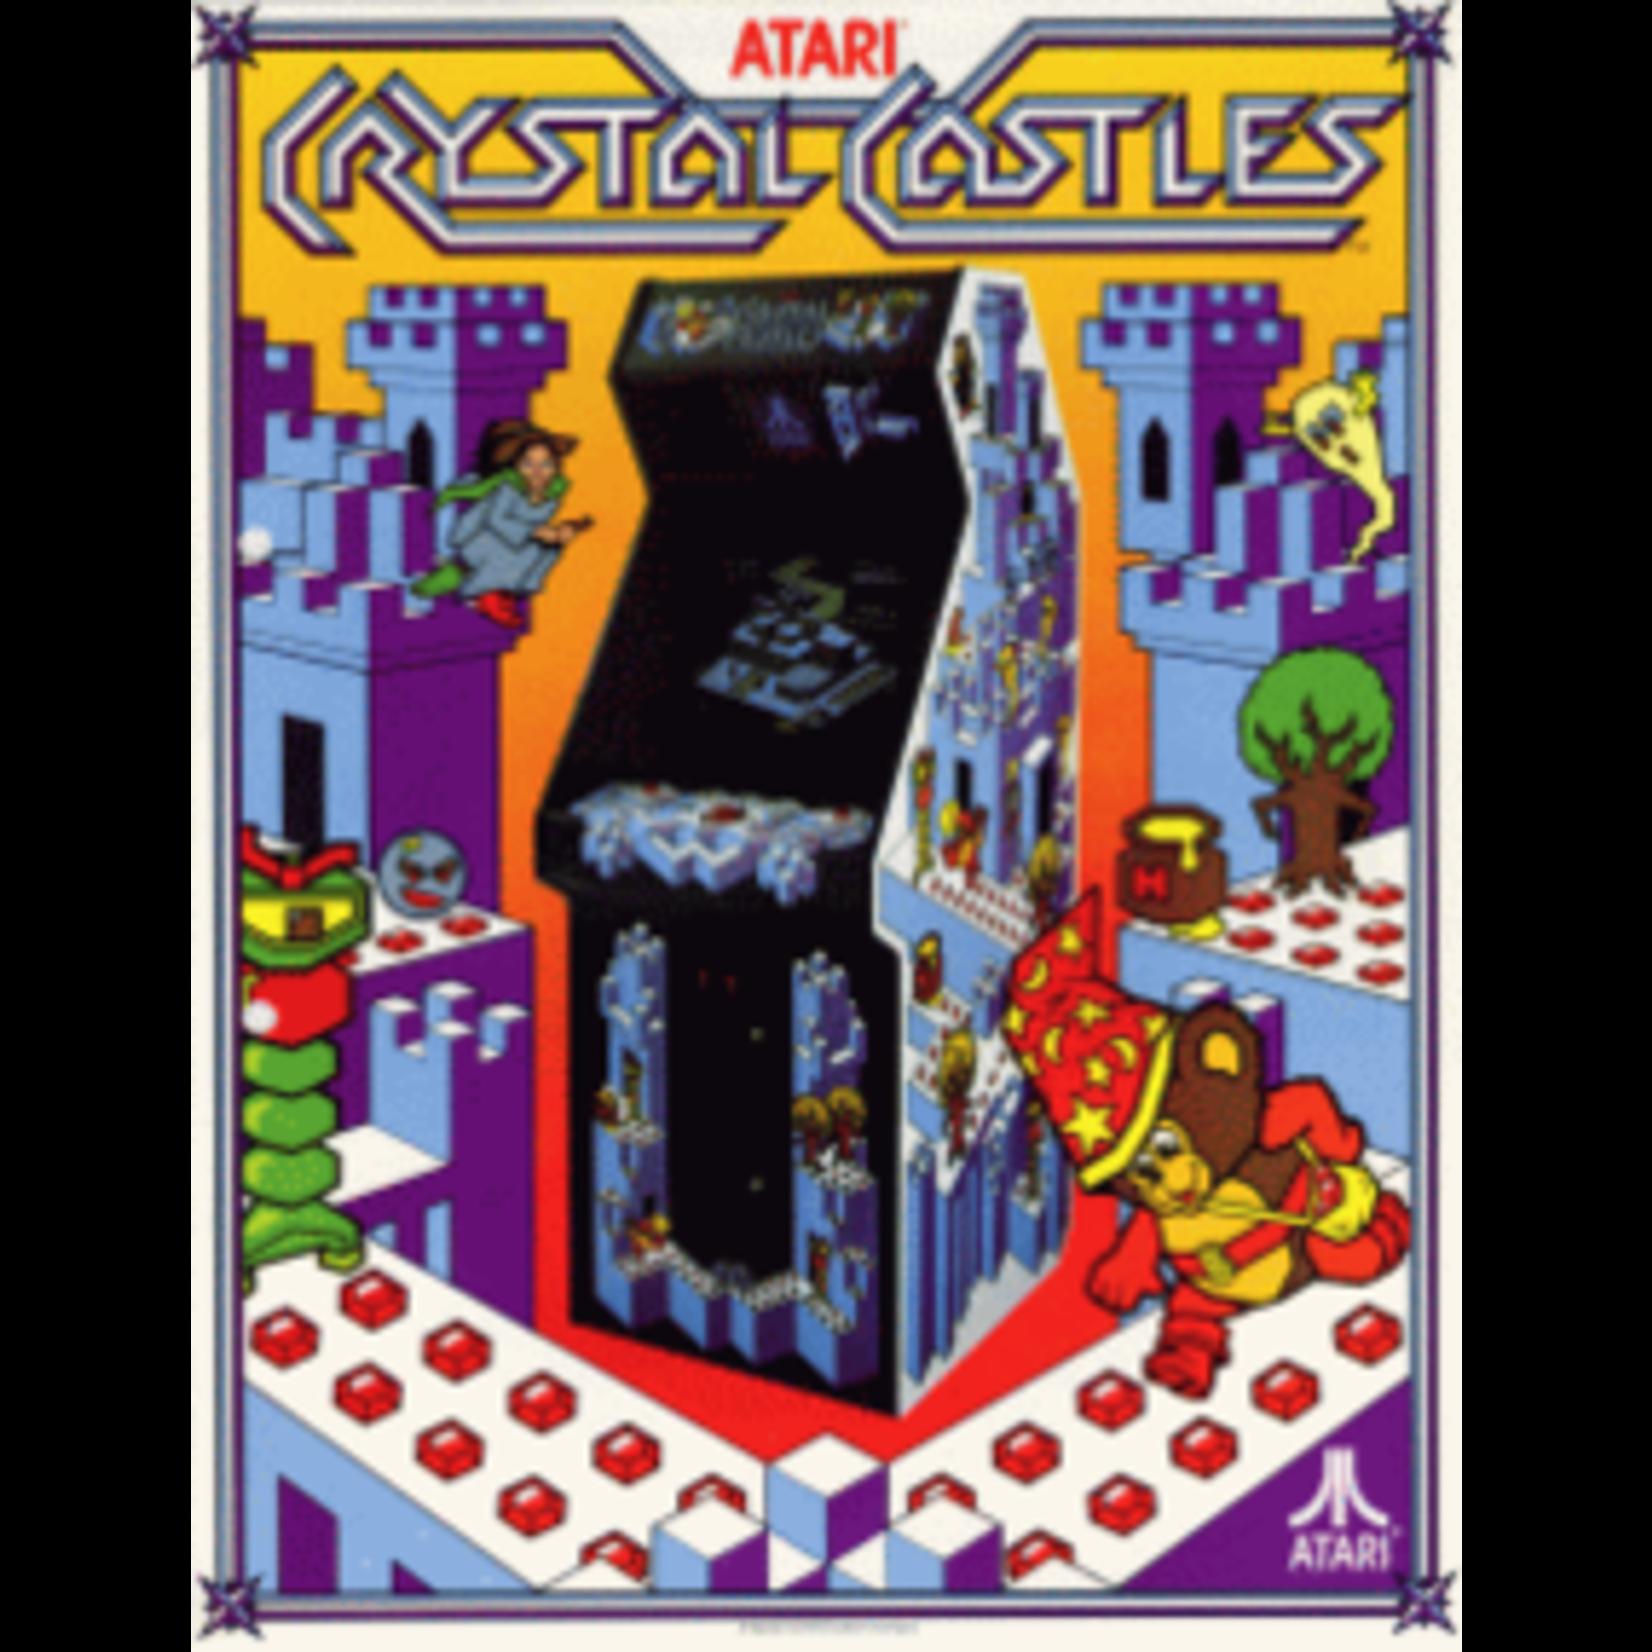 atariu-Crystal Castles